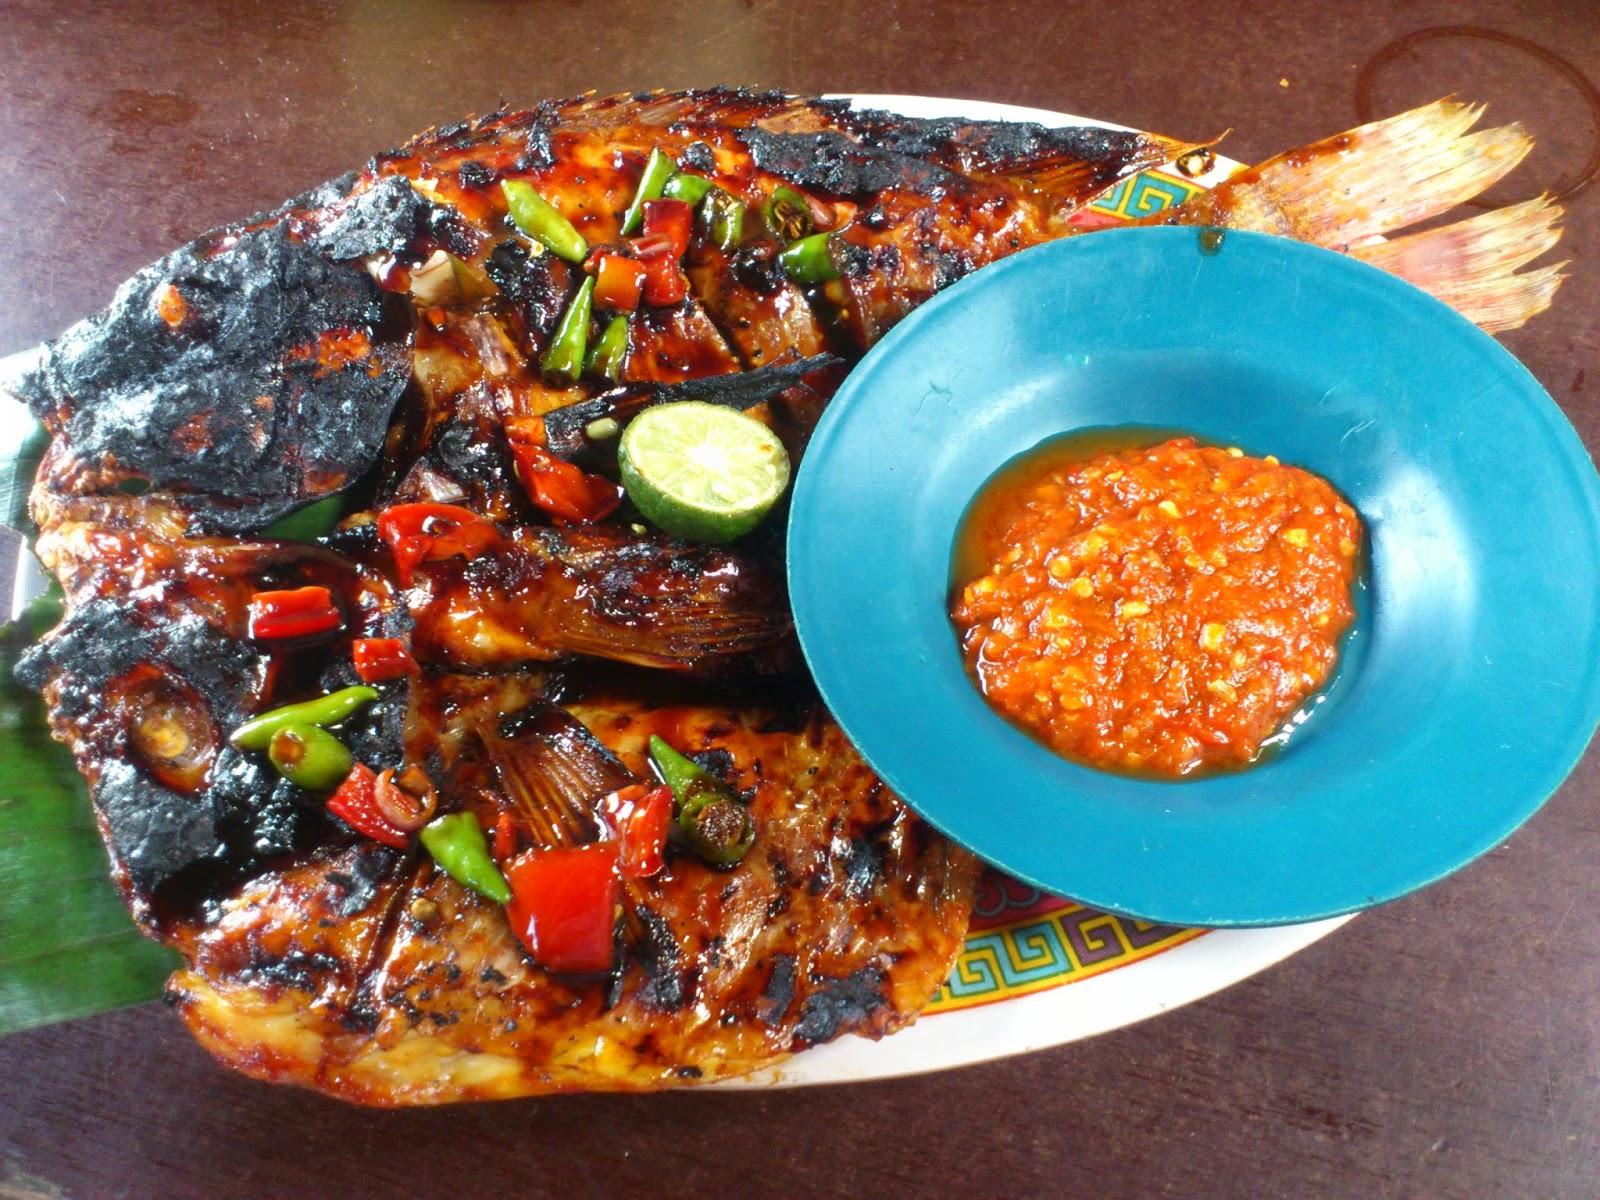 resto seafood di Jakarta Pusat, Ikan Bakar Babe Lili, carimakanaja.com